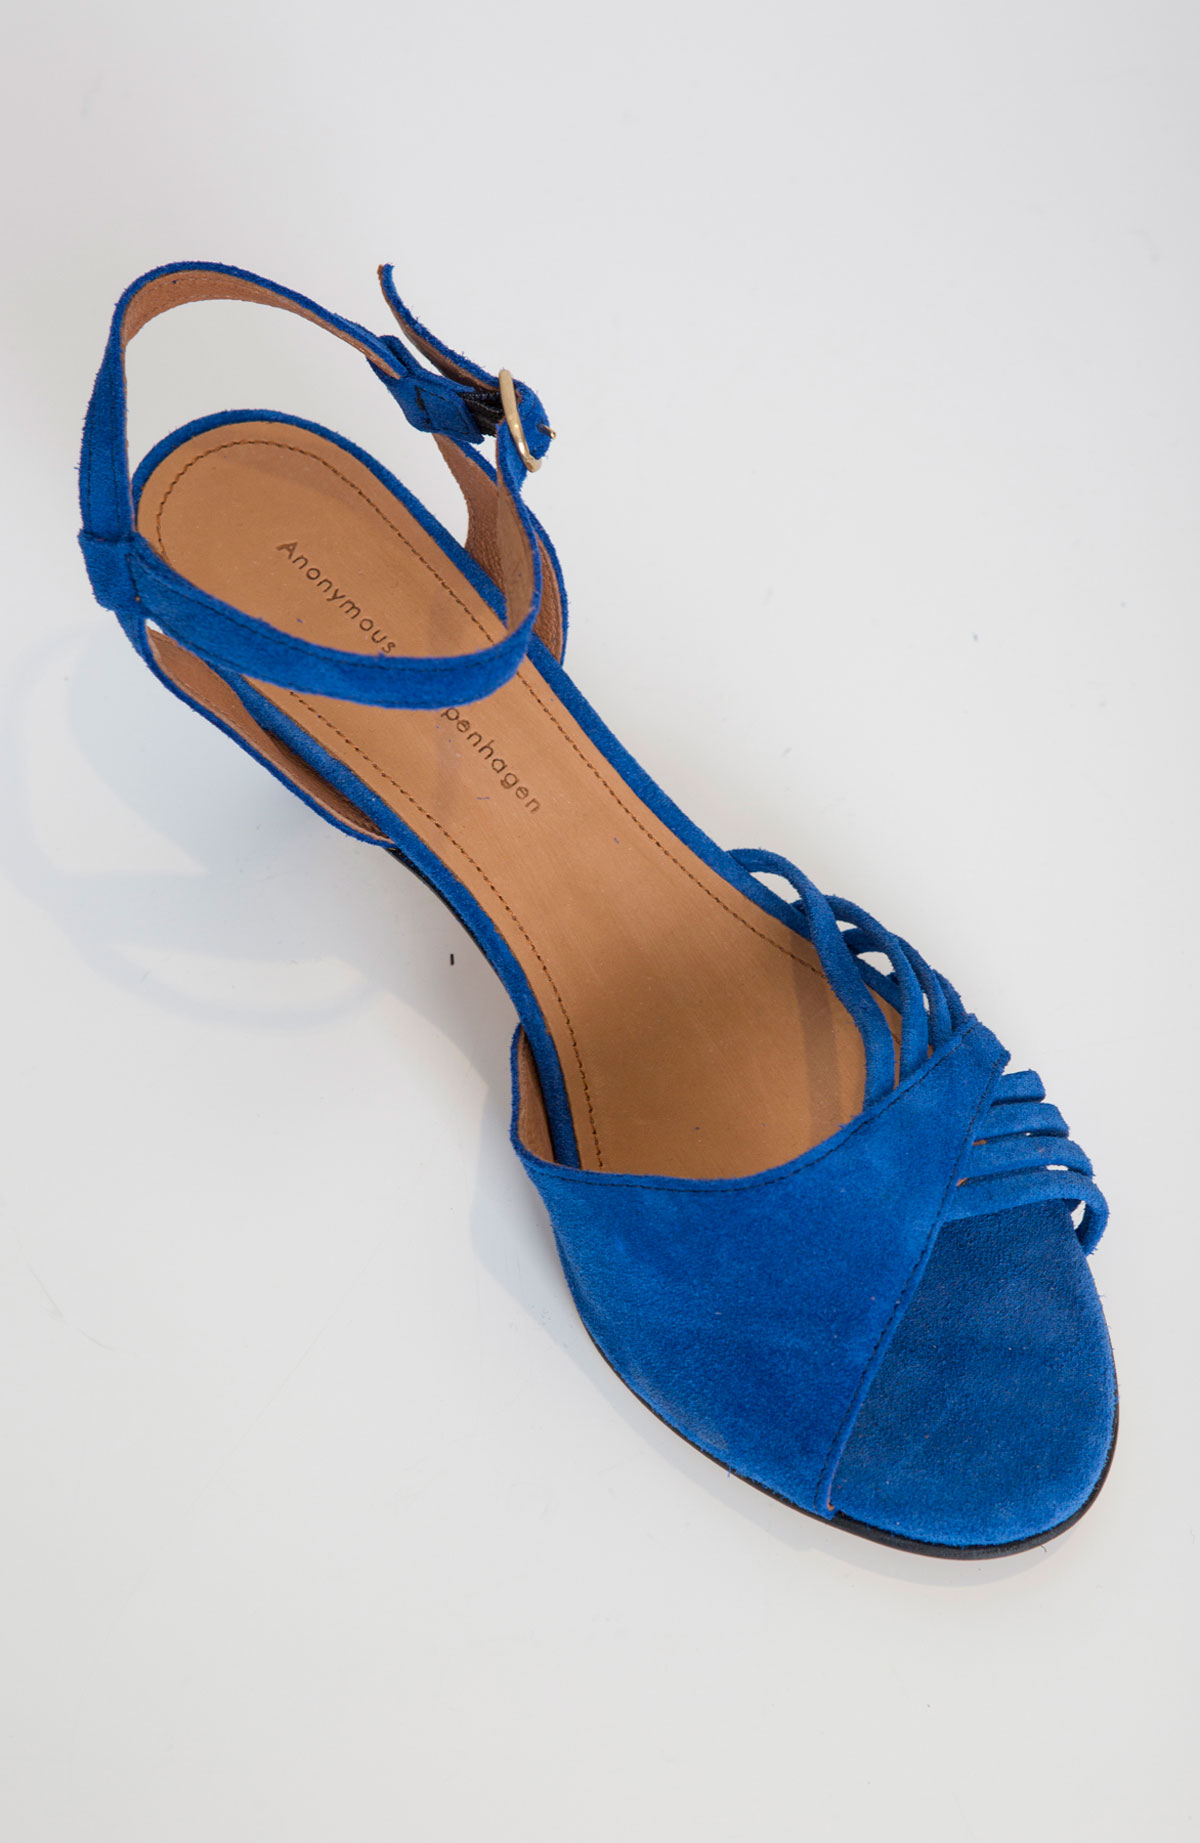 sandal-blue-strap-anonymous-matchboxathens